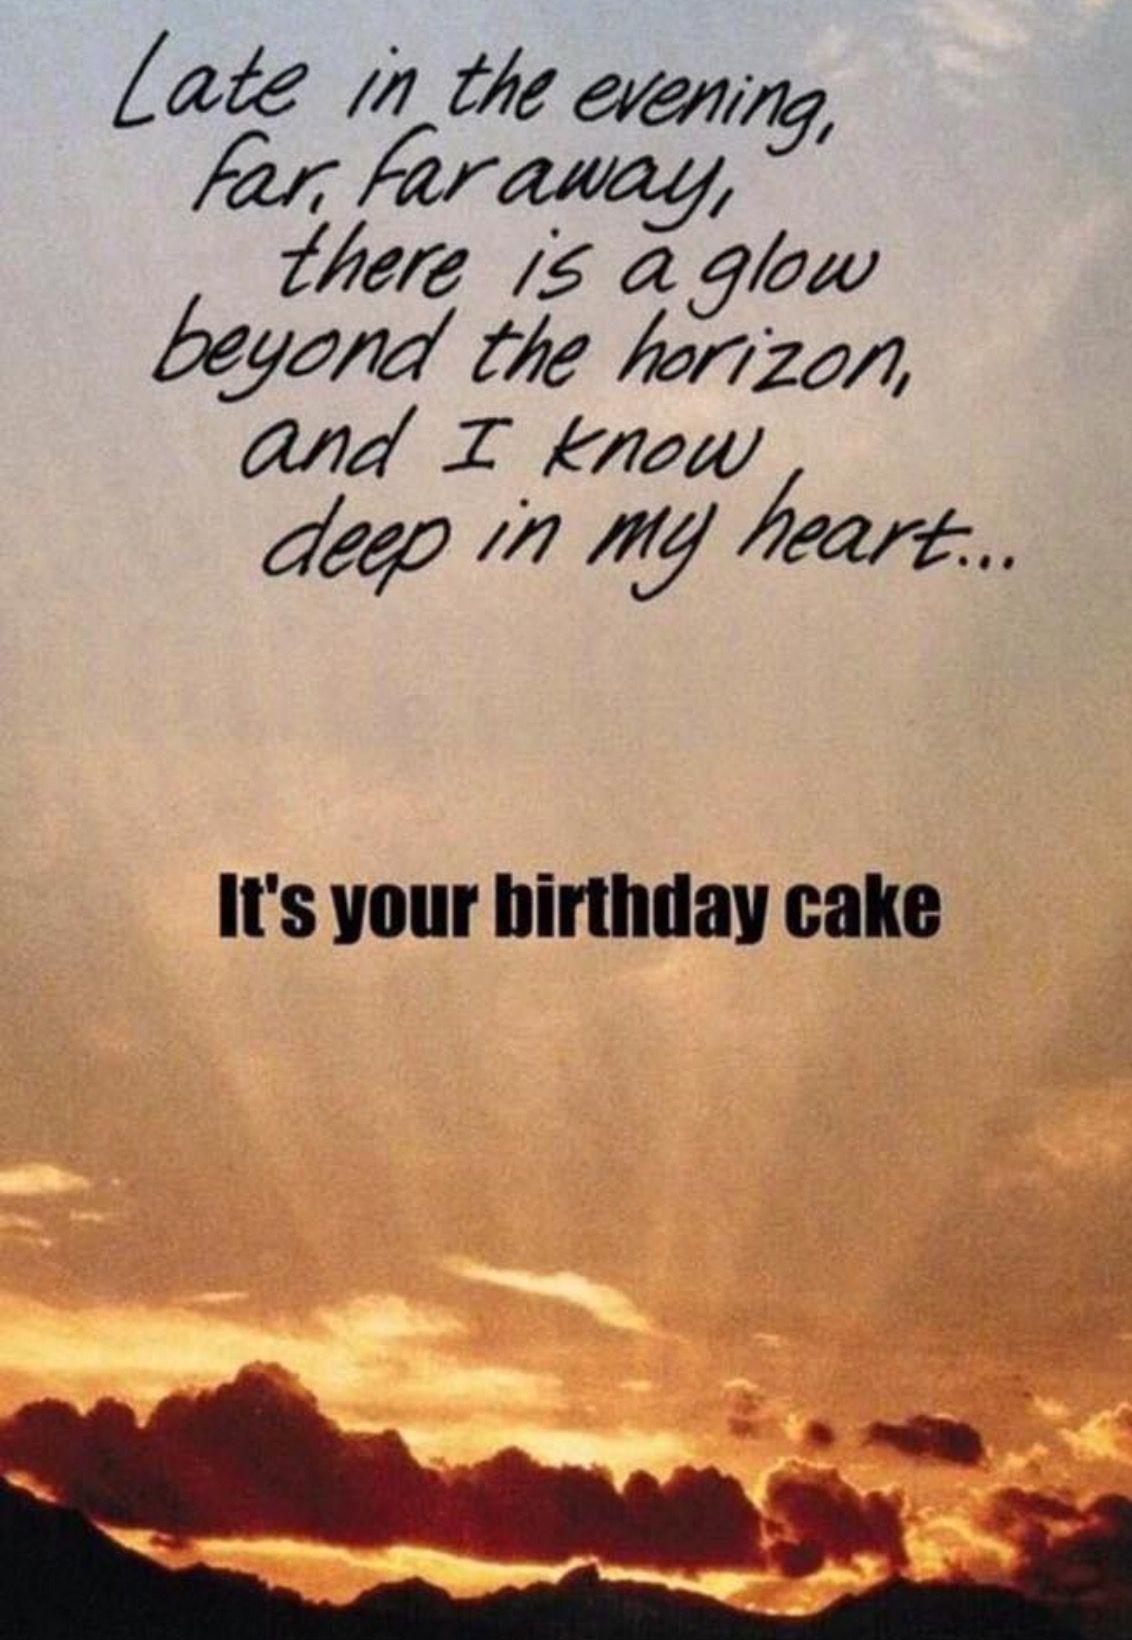 Birthday Meme Friend Far Away